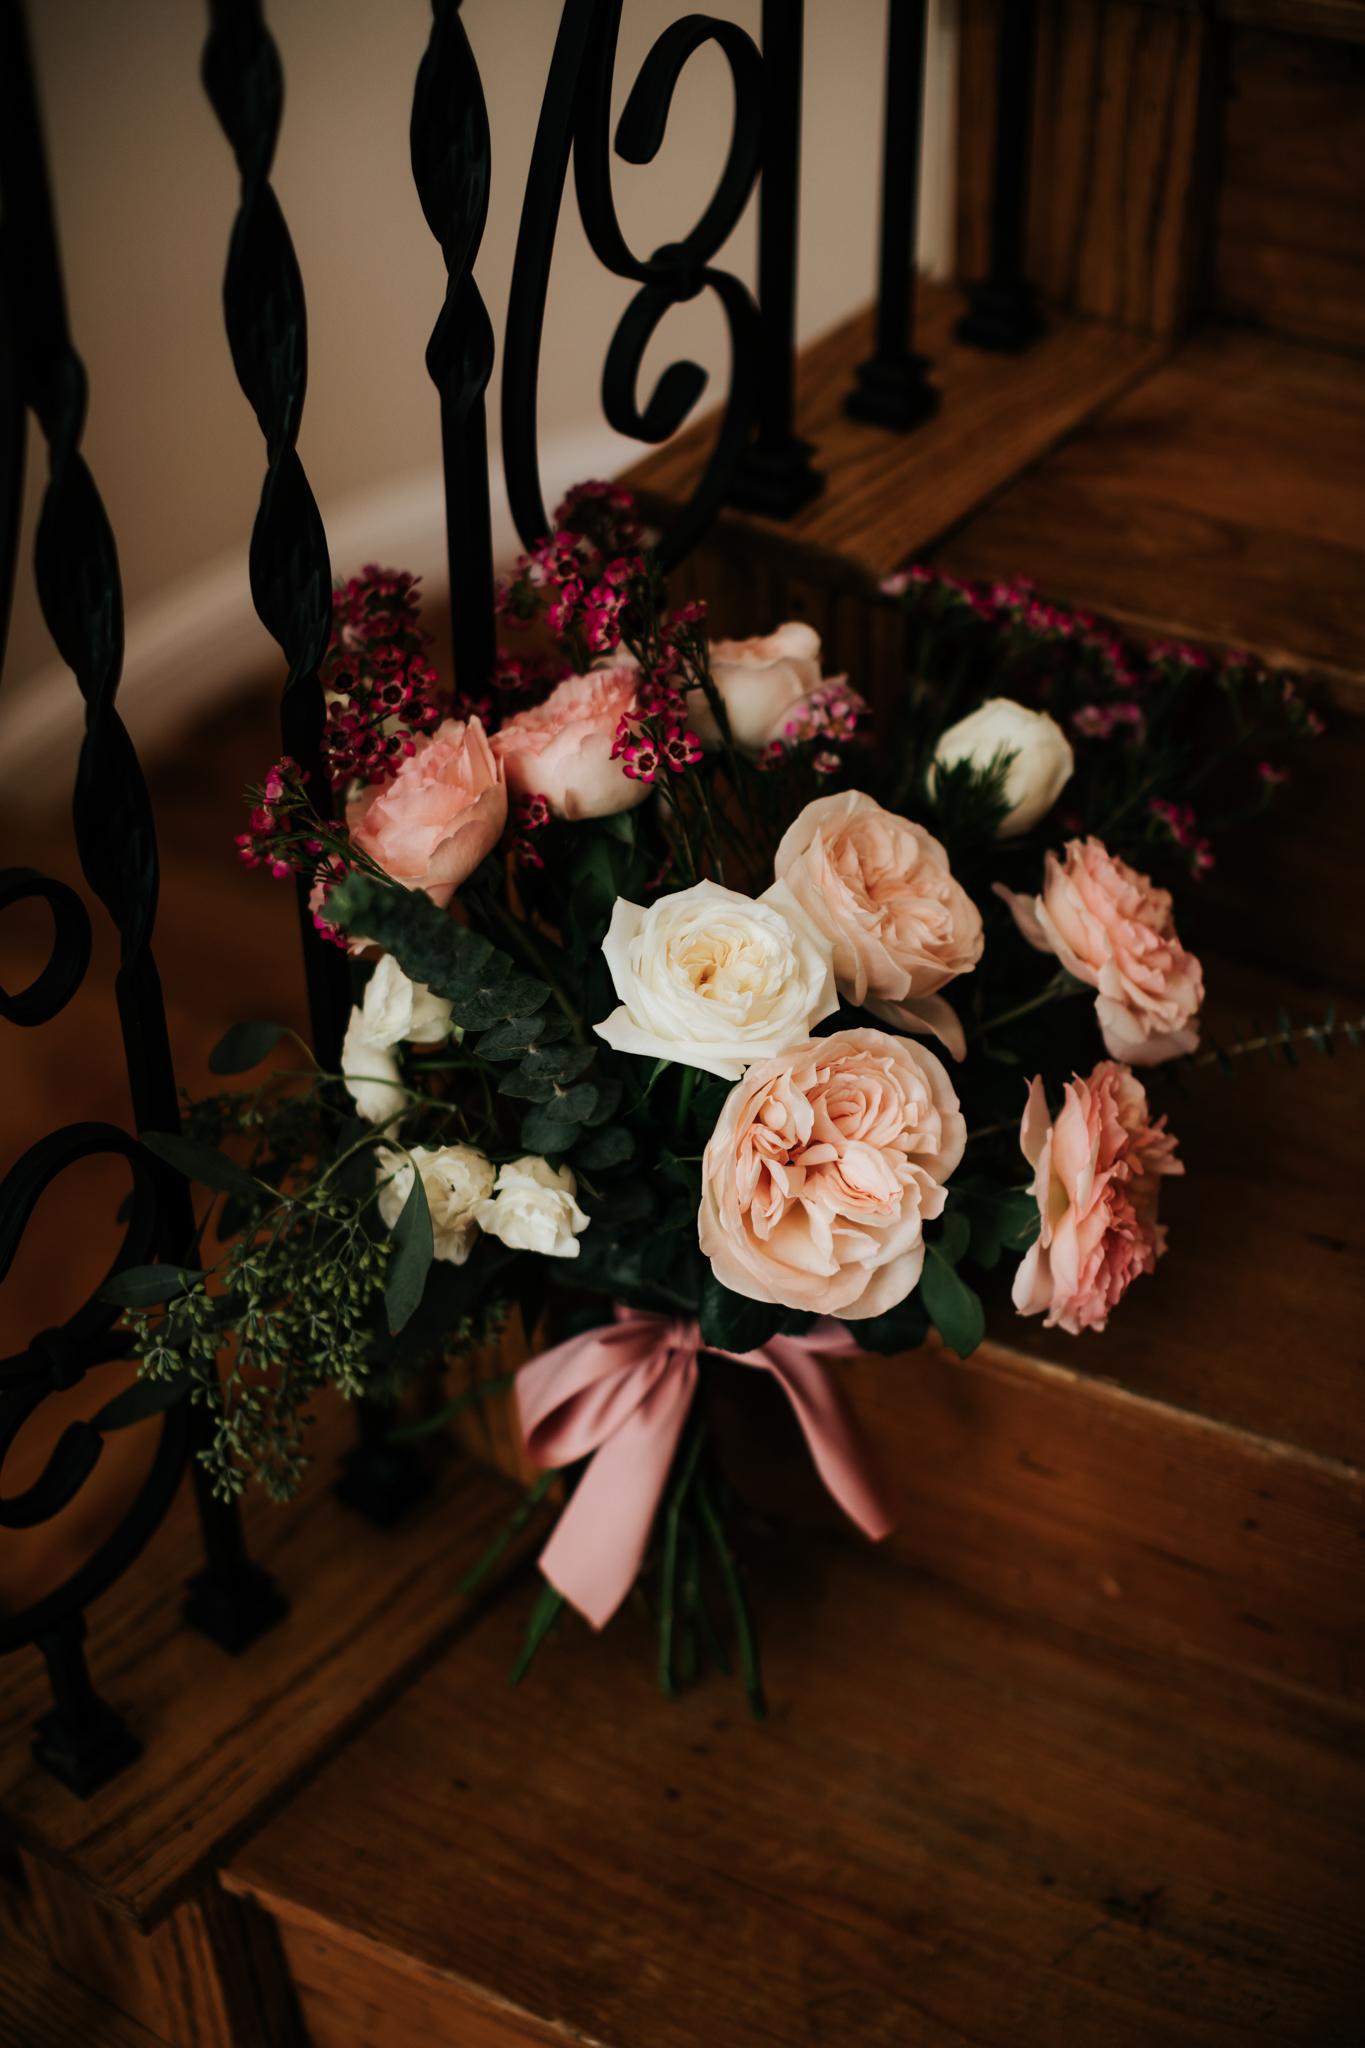 Leah Nicole Photography - Houston Wedding Photographer-Lake Conroe Wedding- Houston Wedding Photographer-5.jpg